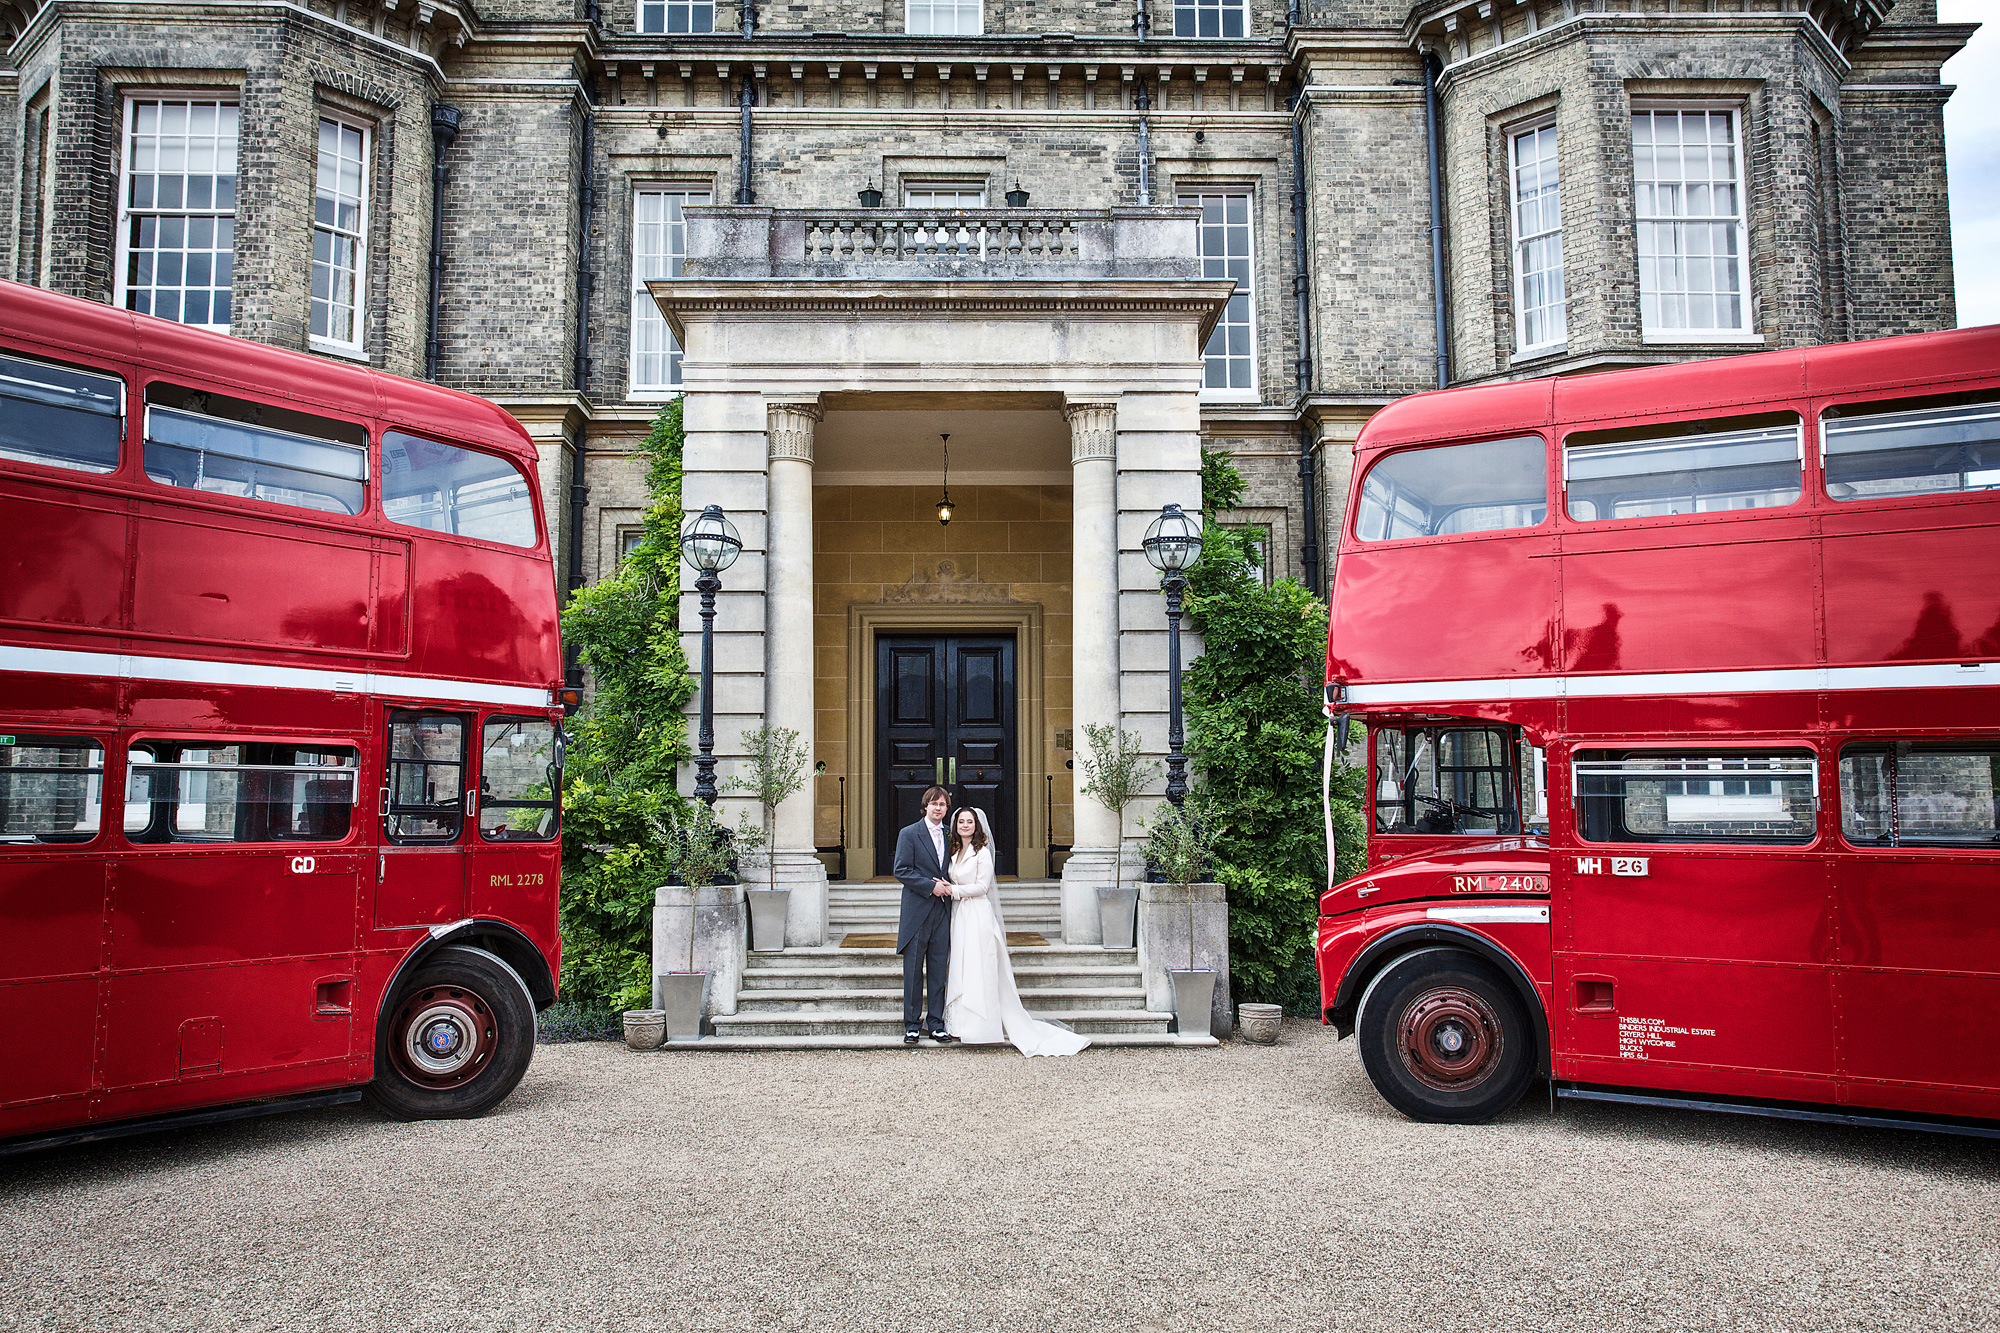 Adam_Hillier_Wedding_Photographer_Newbury_Berkshire_0 (10).jpg